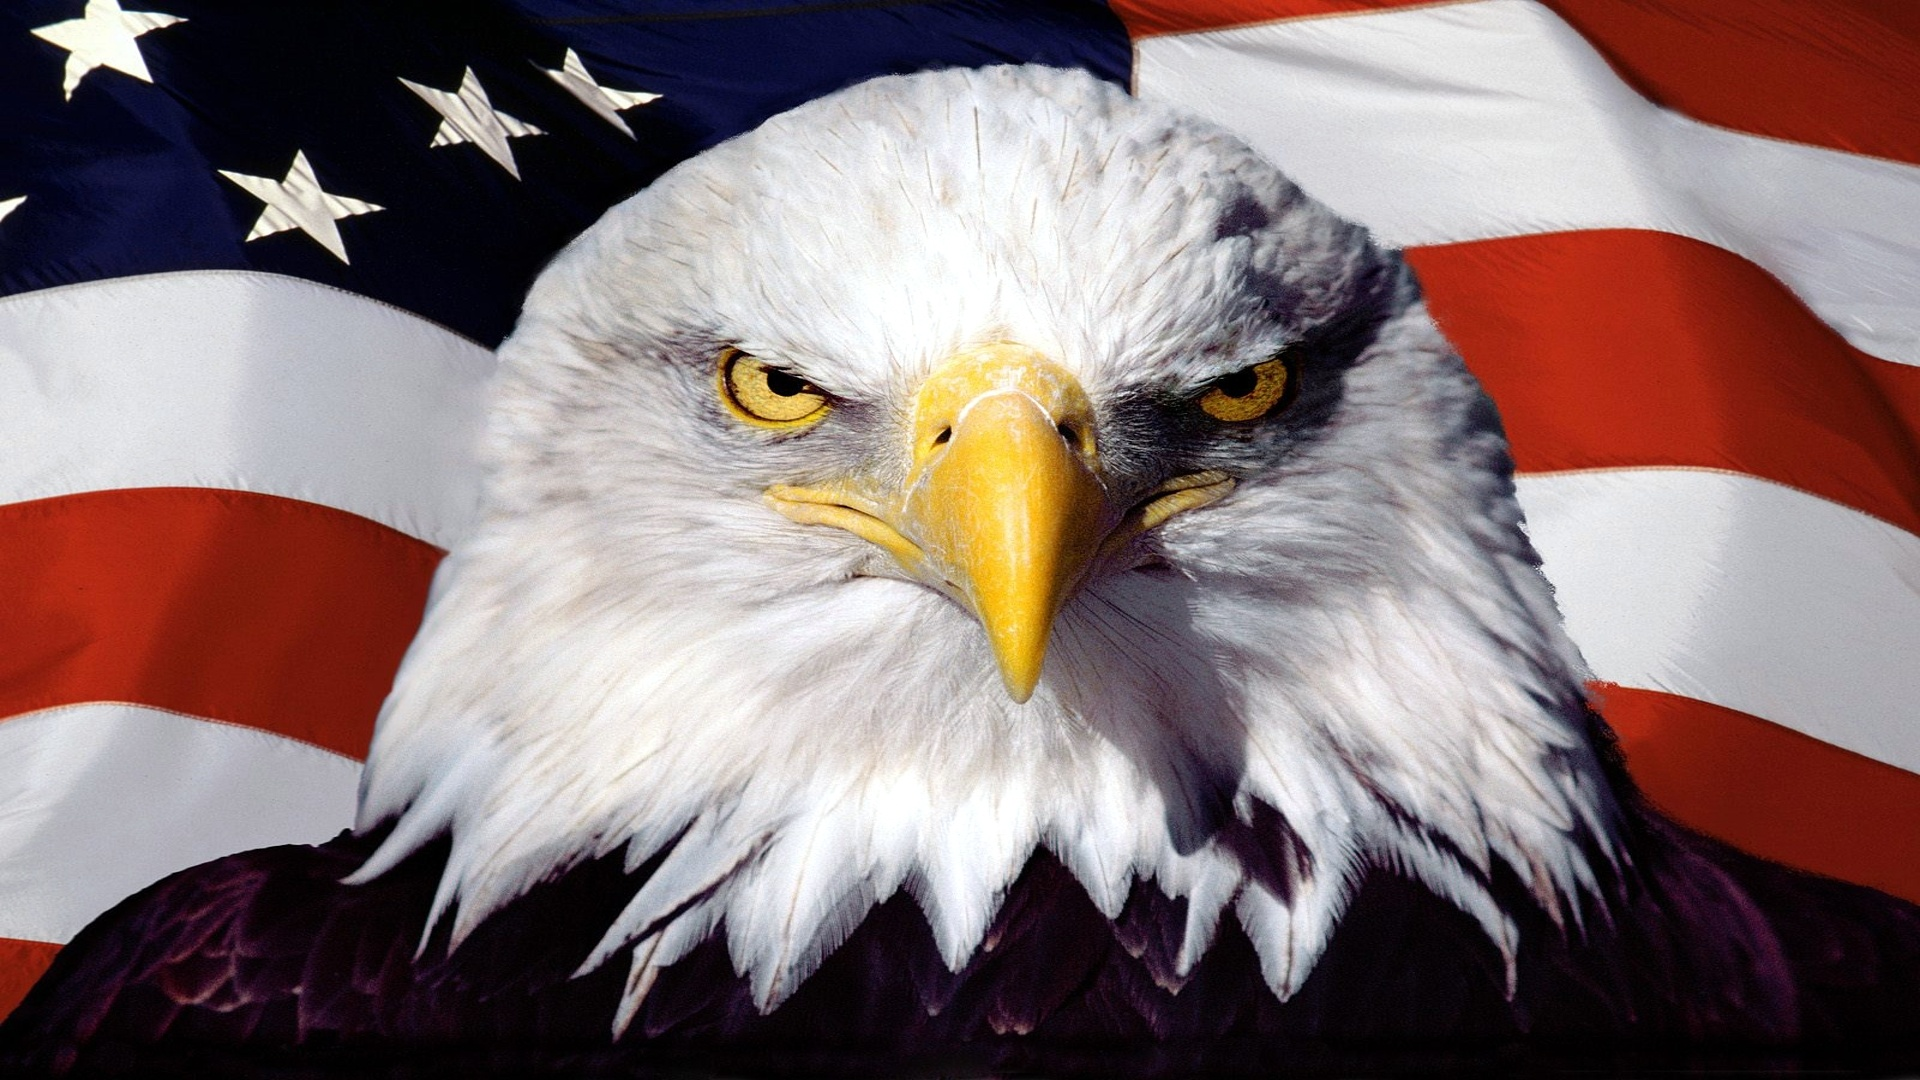 American Eagle Flag Wallpaper HDjpg 1920x1080